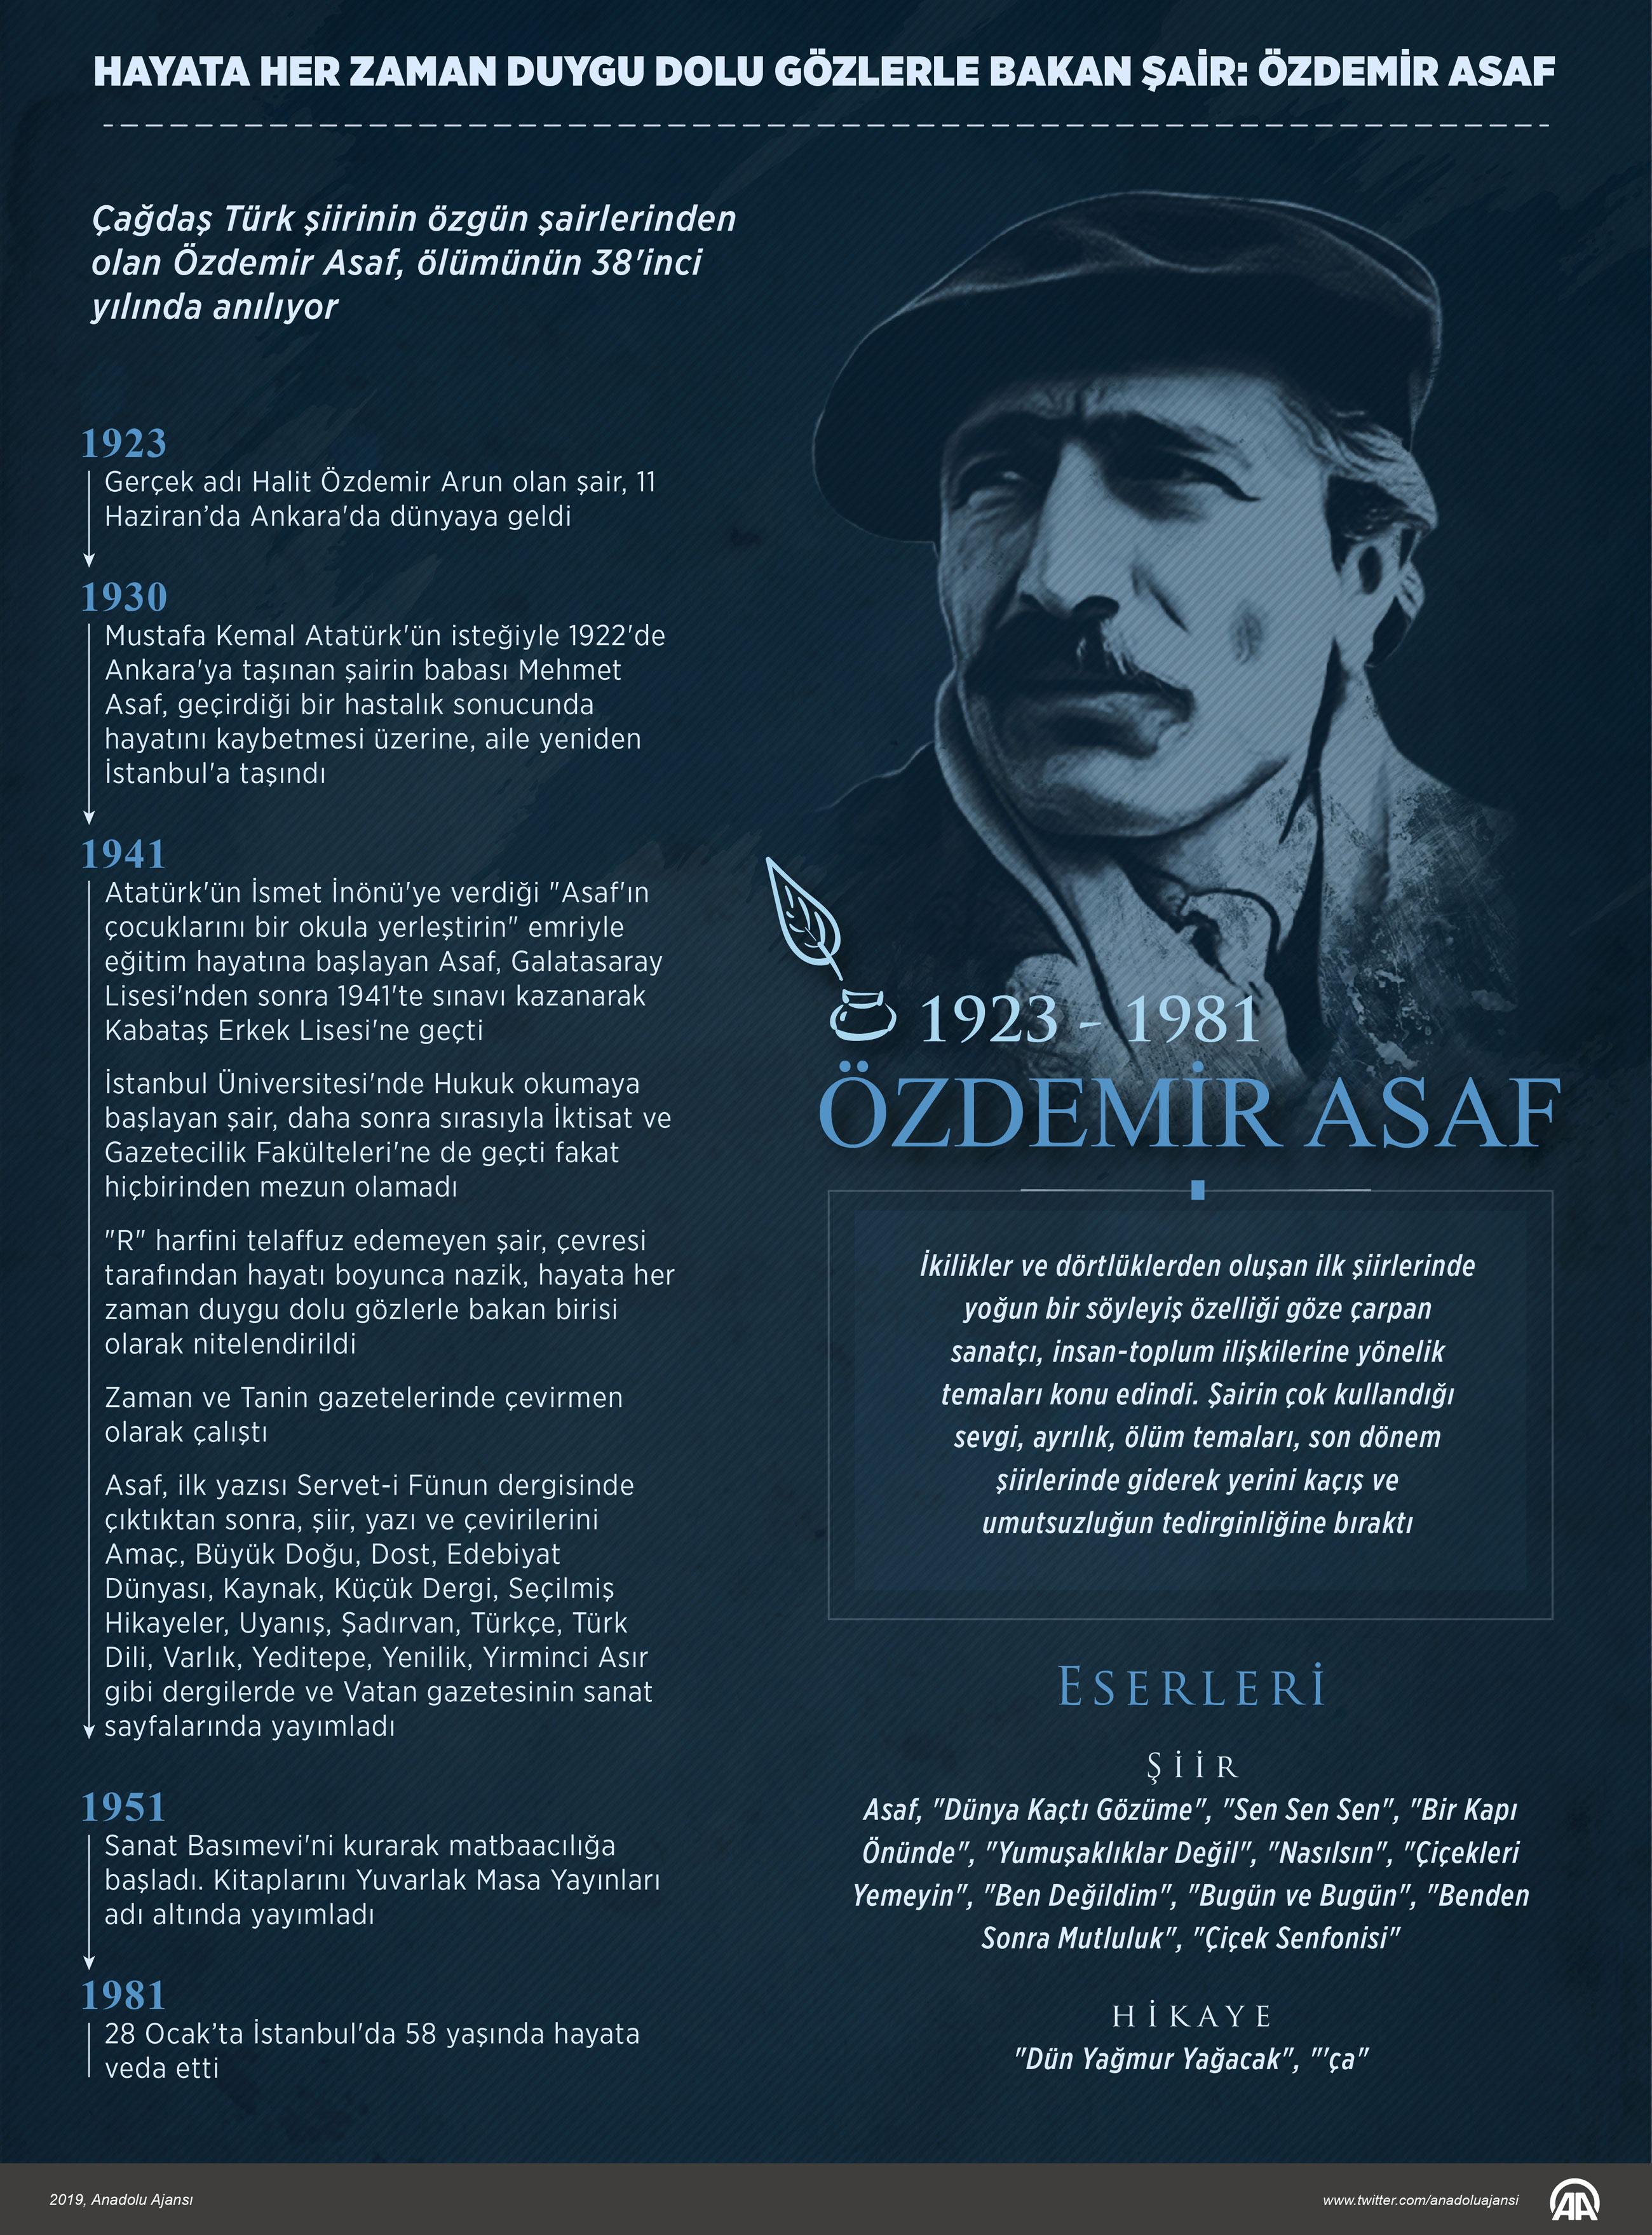 ozdemir-asaf2.jpg